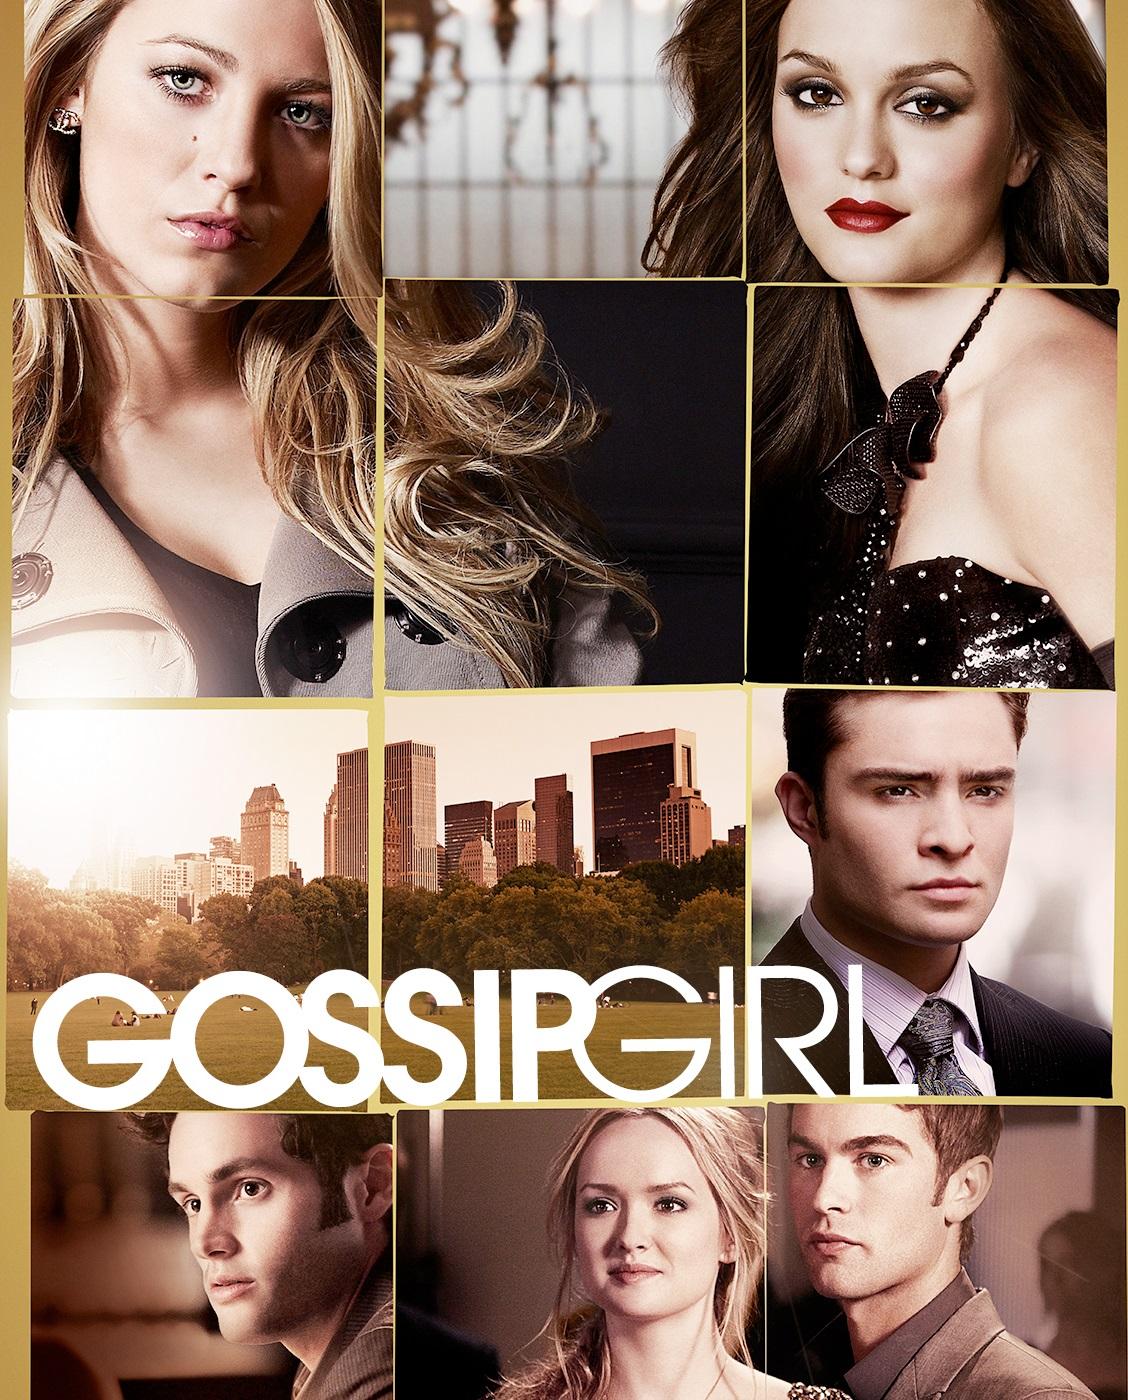 http://tvstock.net/sites/default/files/poster-gossip-girl-season-6.jpg